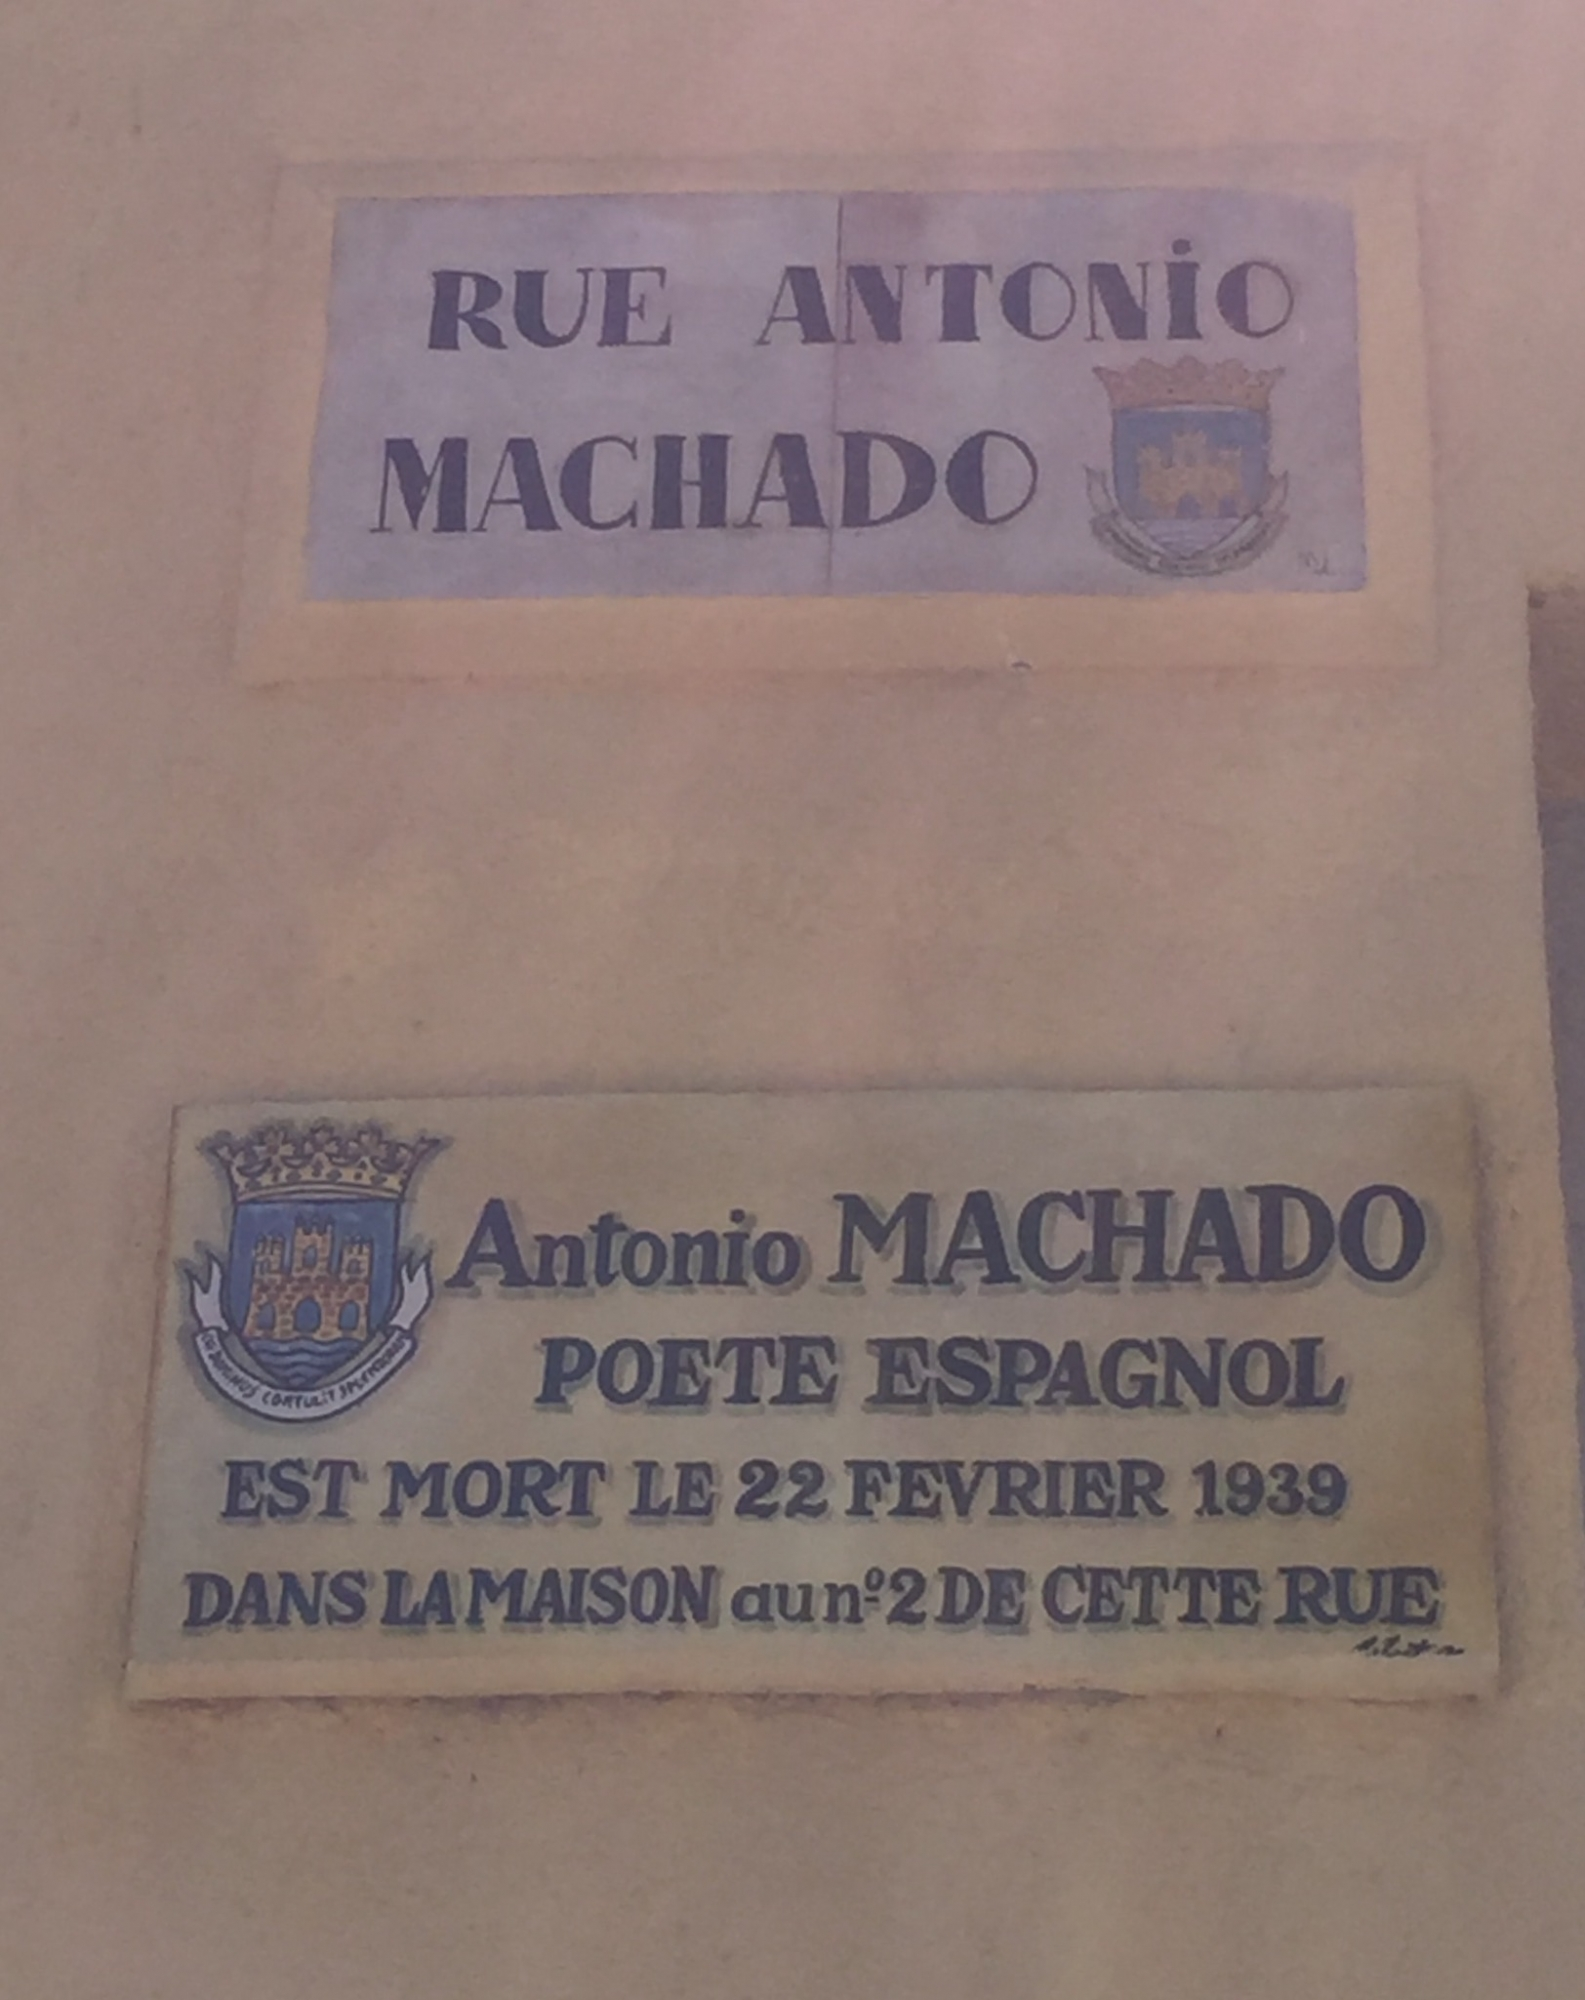 Antonio machado poemas cortos yahoo dating. Dating for one night.